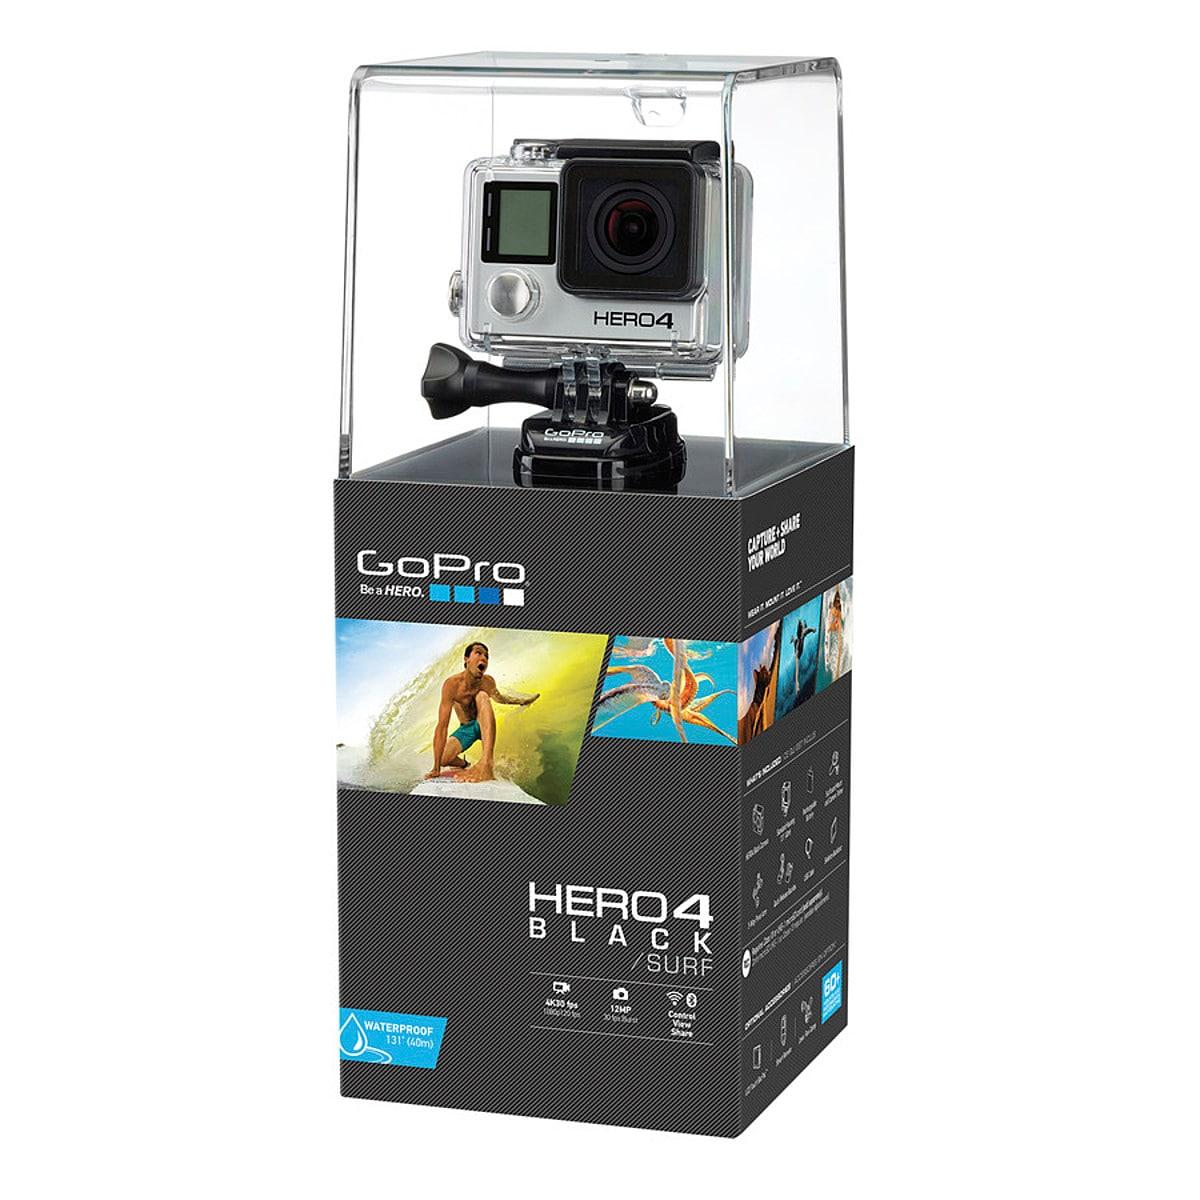 GoPro HERO4 Black Edition - Surf